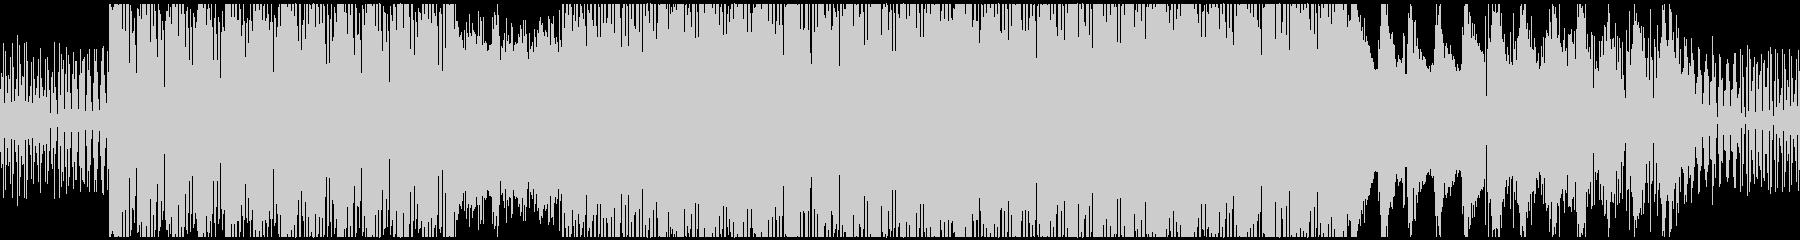 coolなシンセLOOPBGMの未再生の波形